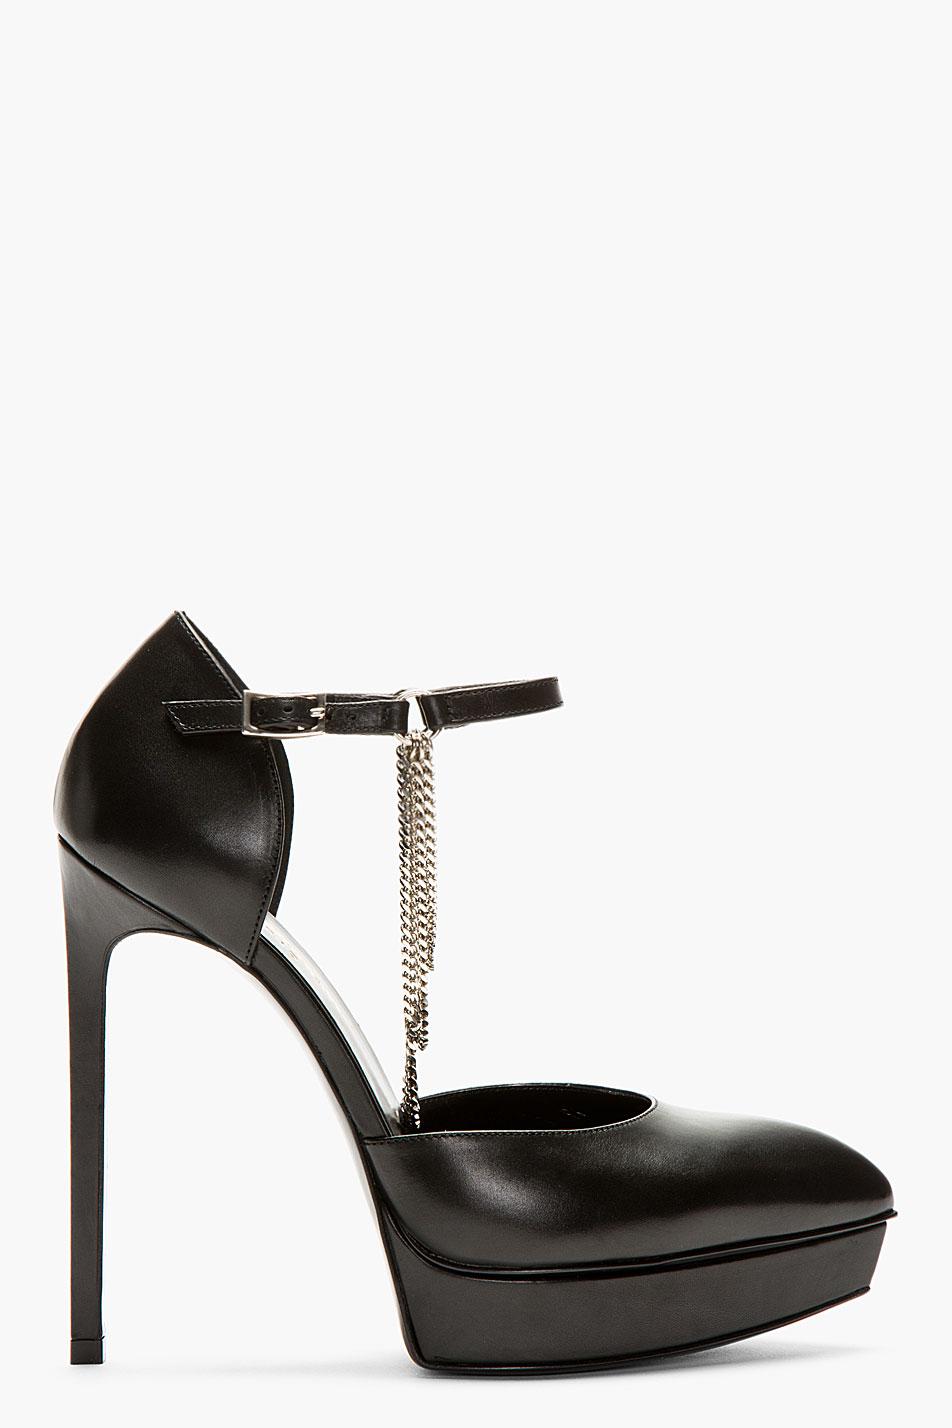 Lyst Saint Laurent Black Leather Chain Detail Heels In Black